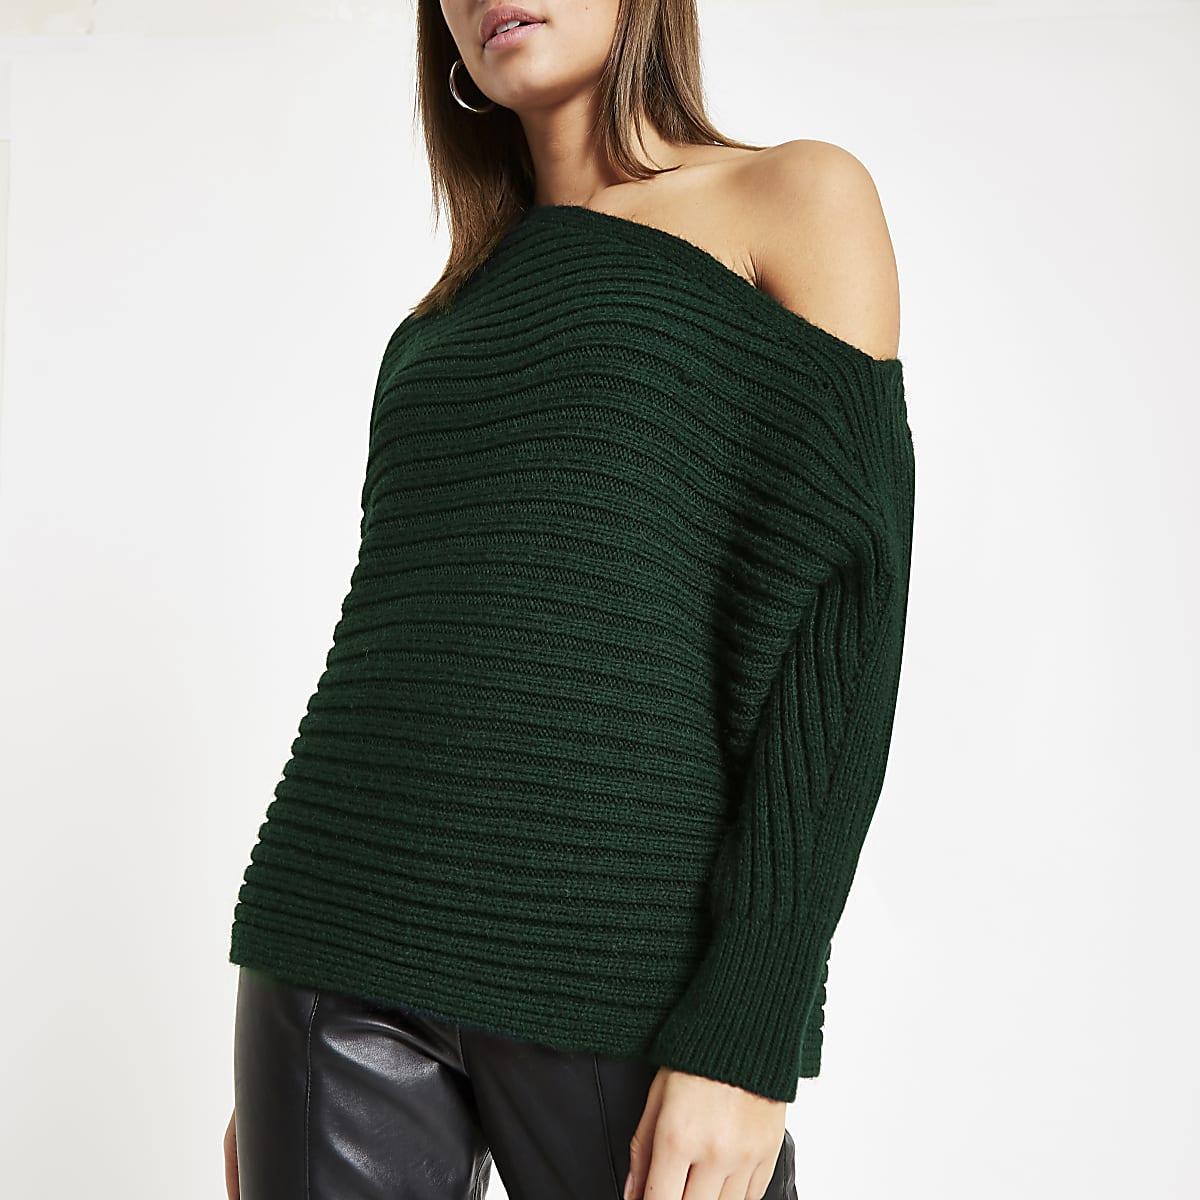 Dark green asymmetric knit sweater